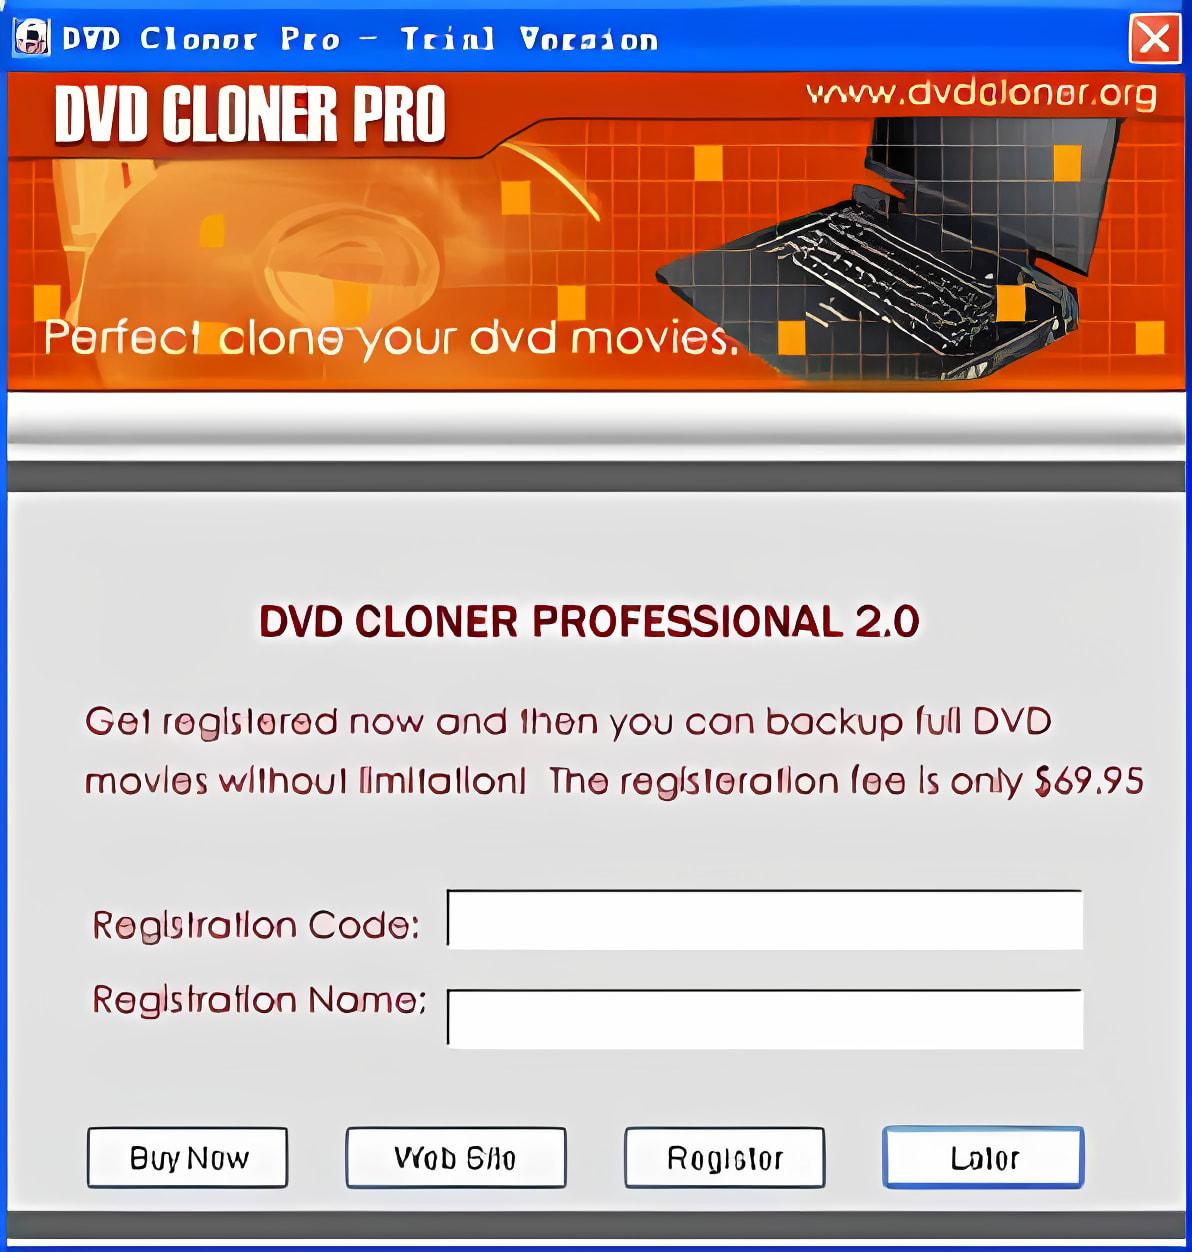 DVD Cloner Pro